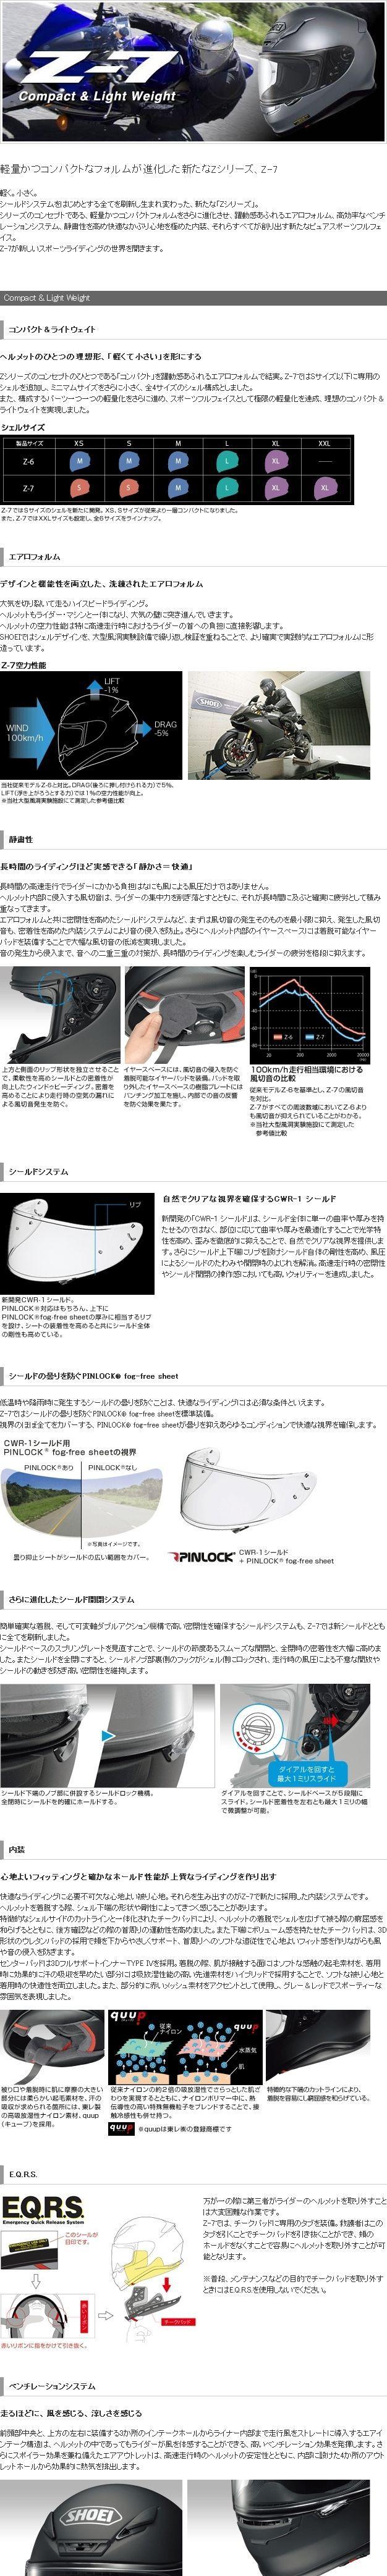 【SHOEI】Z-7 MYSTIFY 全罩式安全帽                            會員價:                        NT$  15,000                    0.0